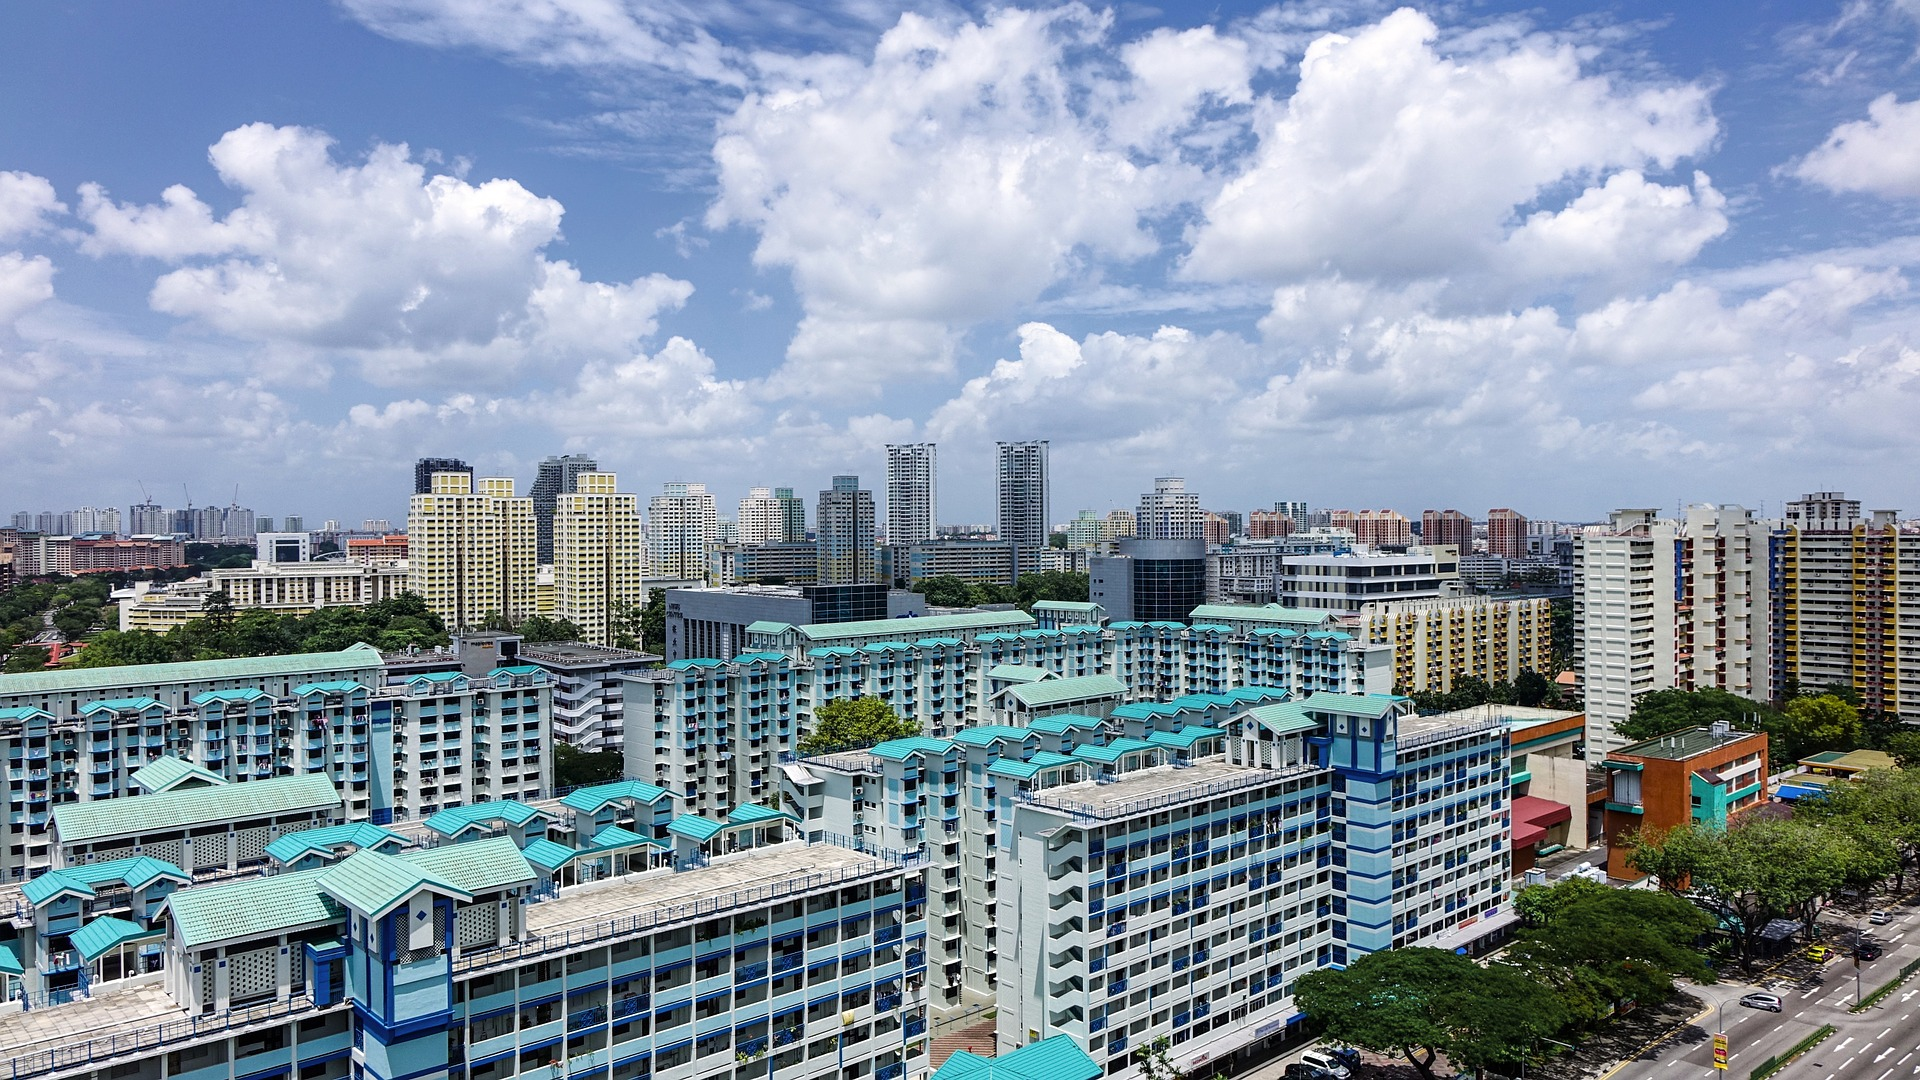 The neighbourhood of Chinatown